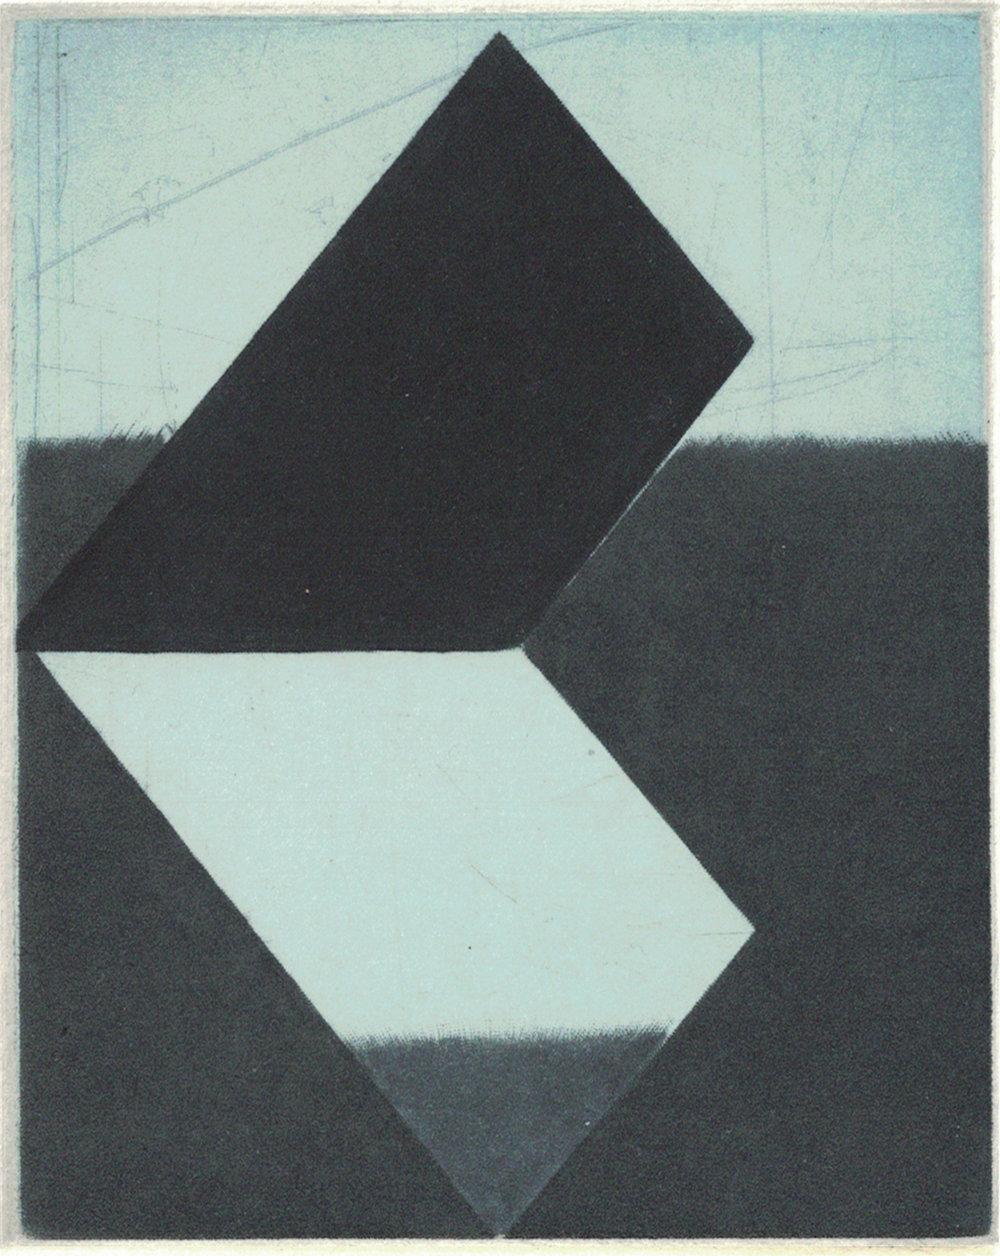 Abb.: Majla Zeneli, OSAC 6, 2018, Mezzotinto-Druck, 10 x 8 cm